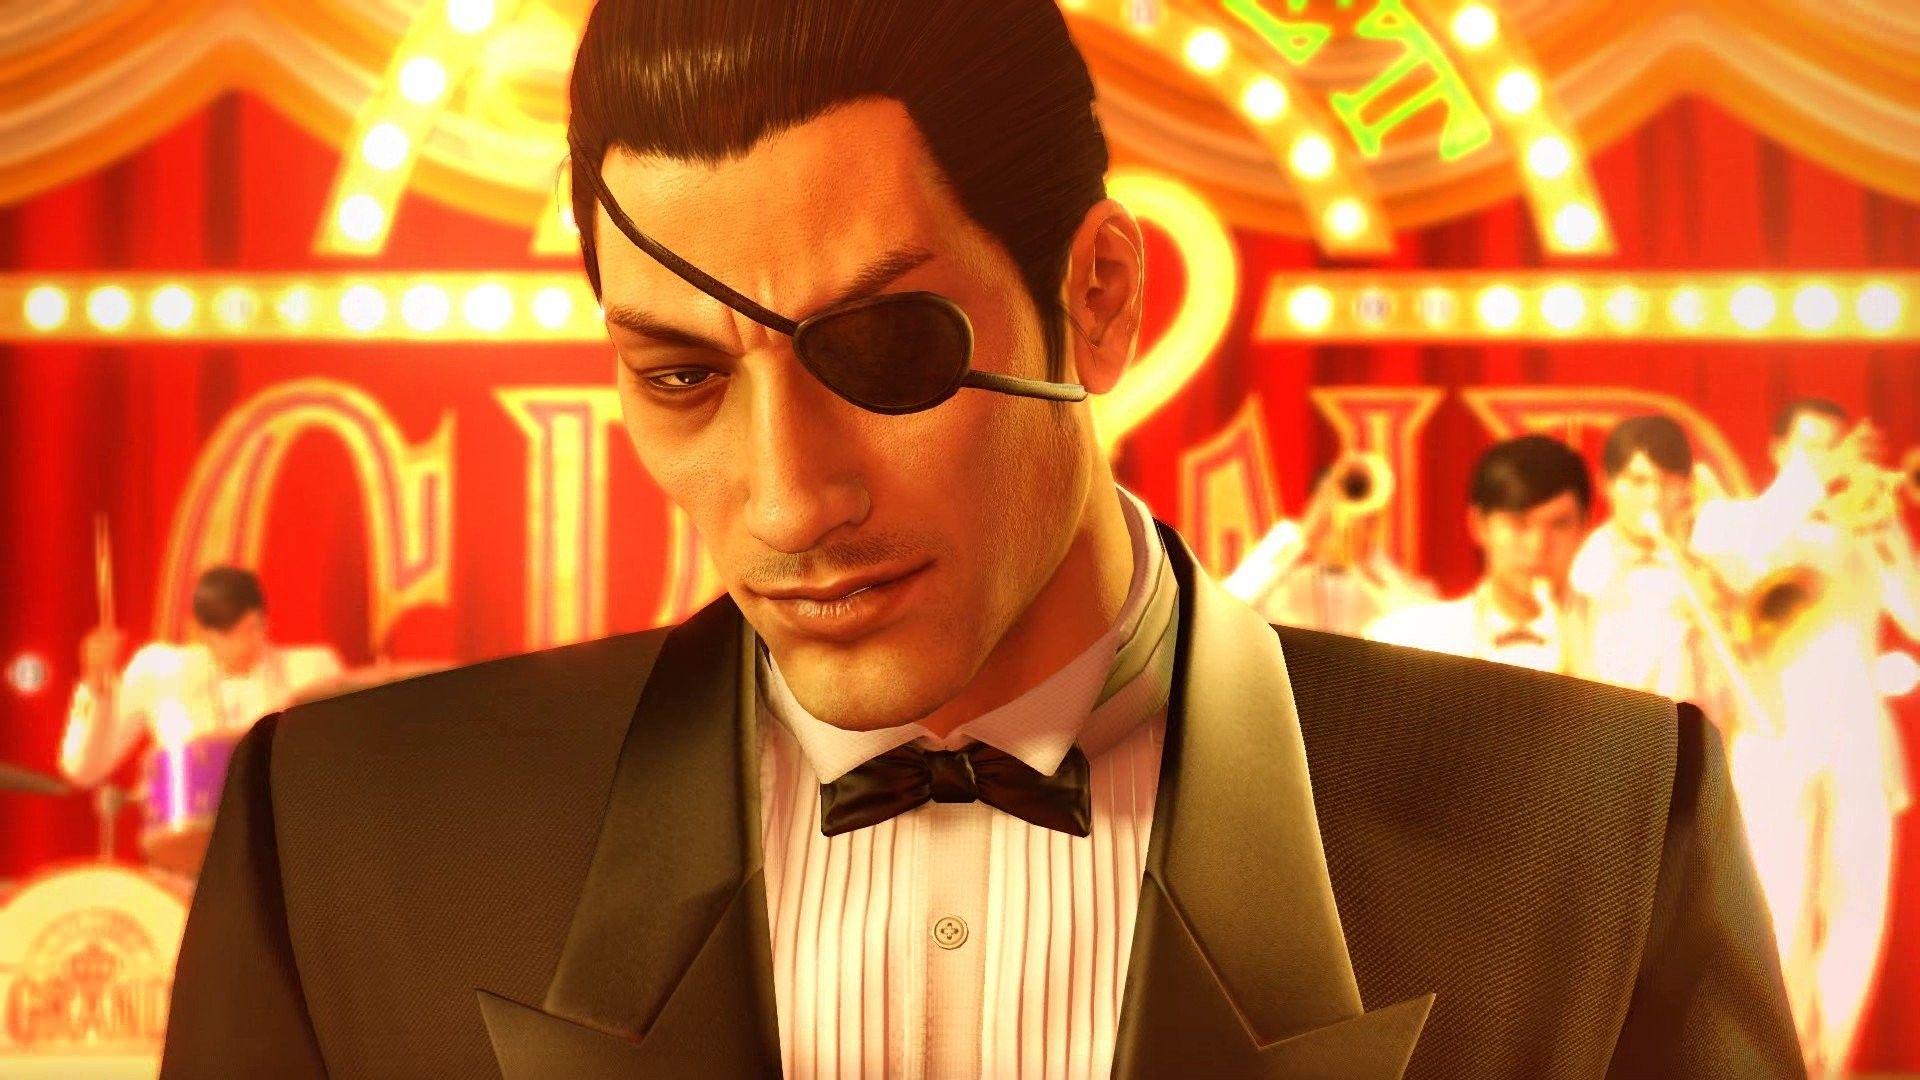 Majima Goro Yakuza Majima In 2019 Video Game Art Games Wallpaper